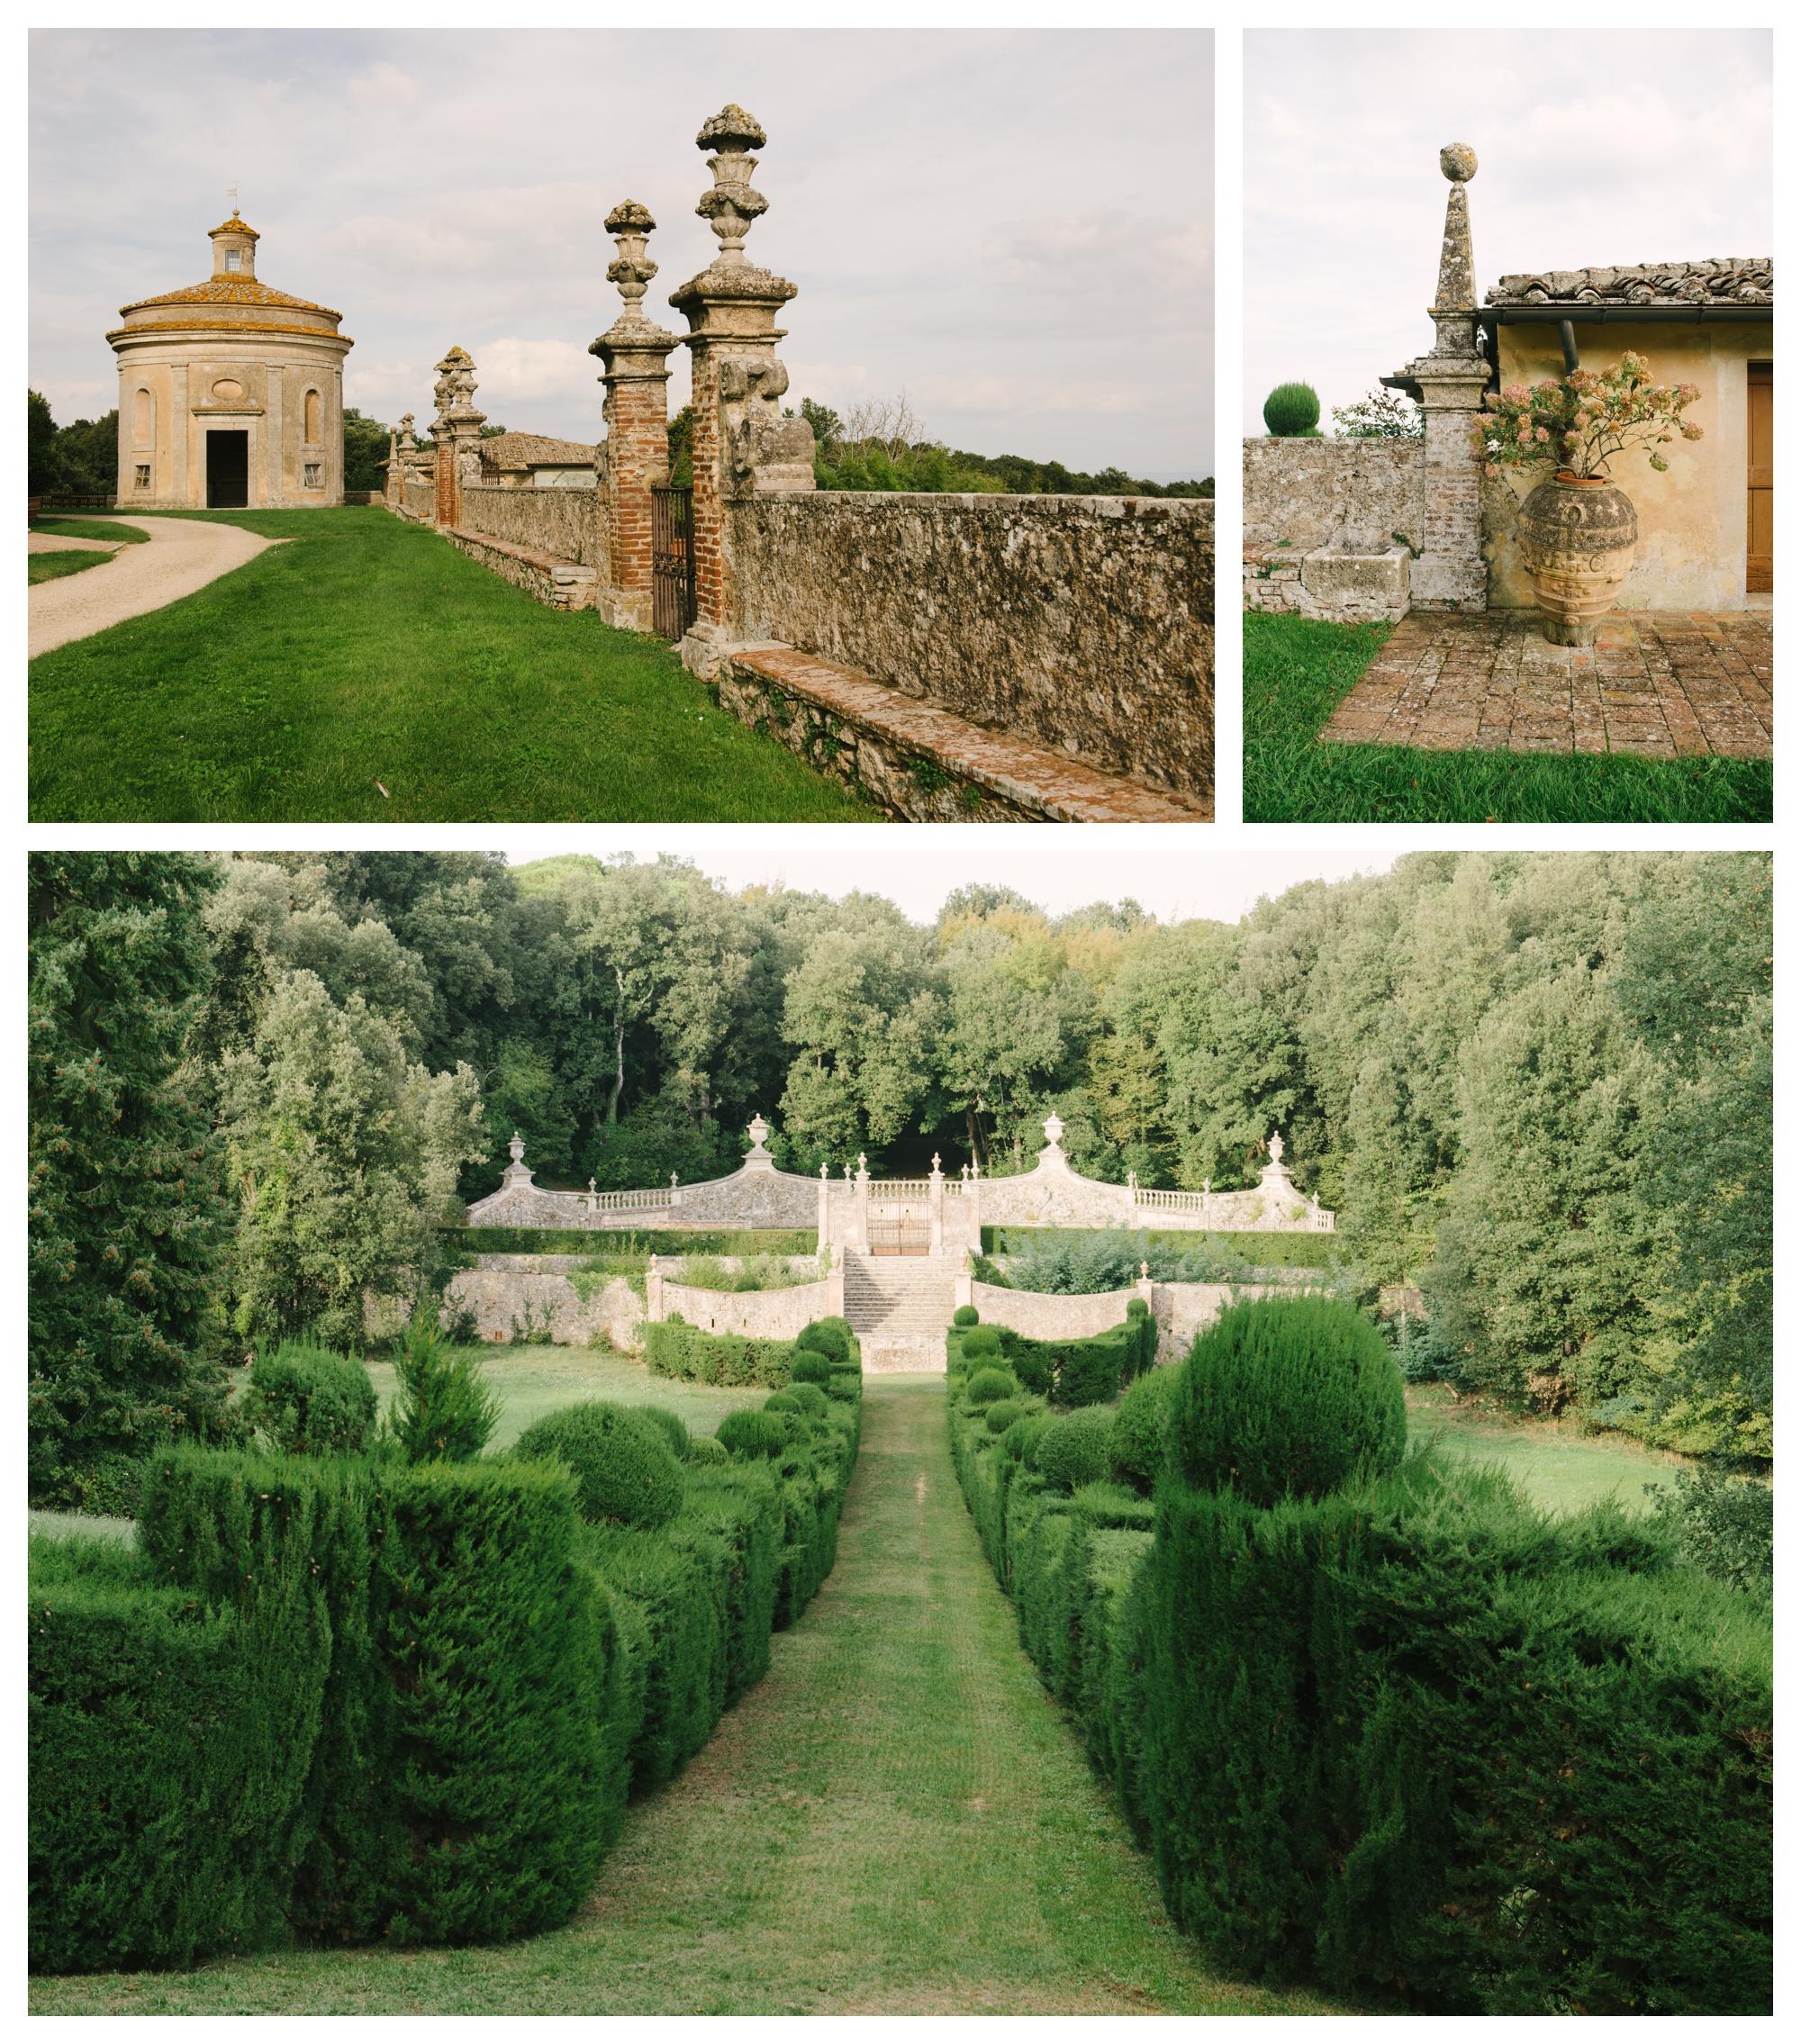 tuscany-castle-wedding-photographer-italy-williamsburgphotostudios-_0001.jpg